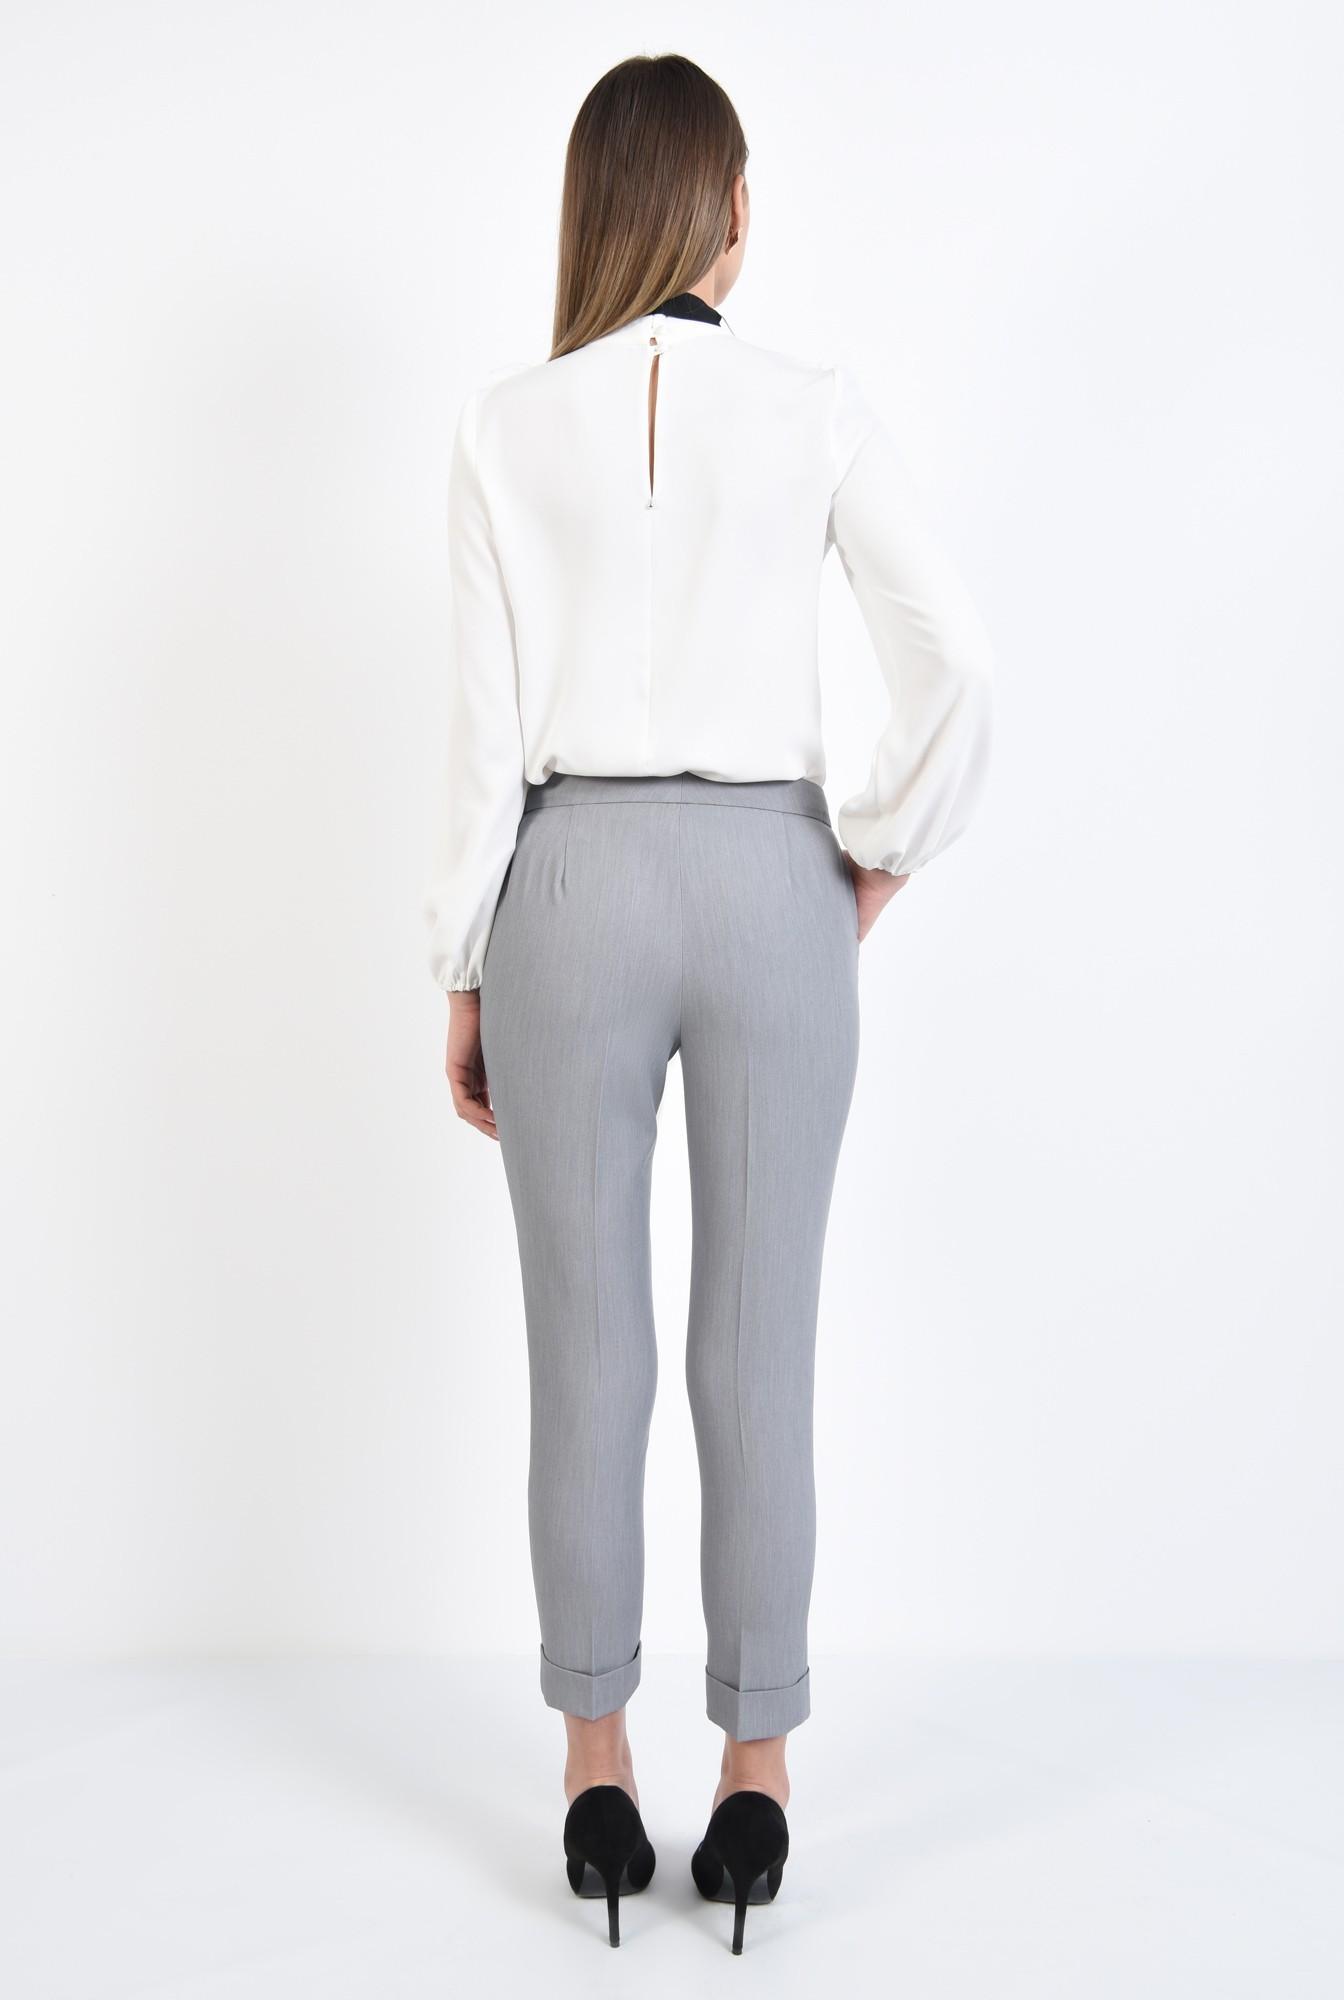 1 - pantaloni gri, office, croi conic, mansete